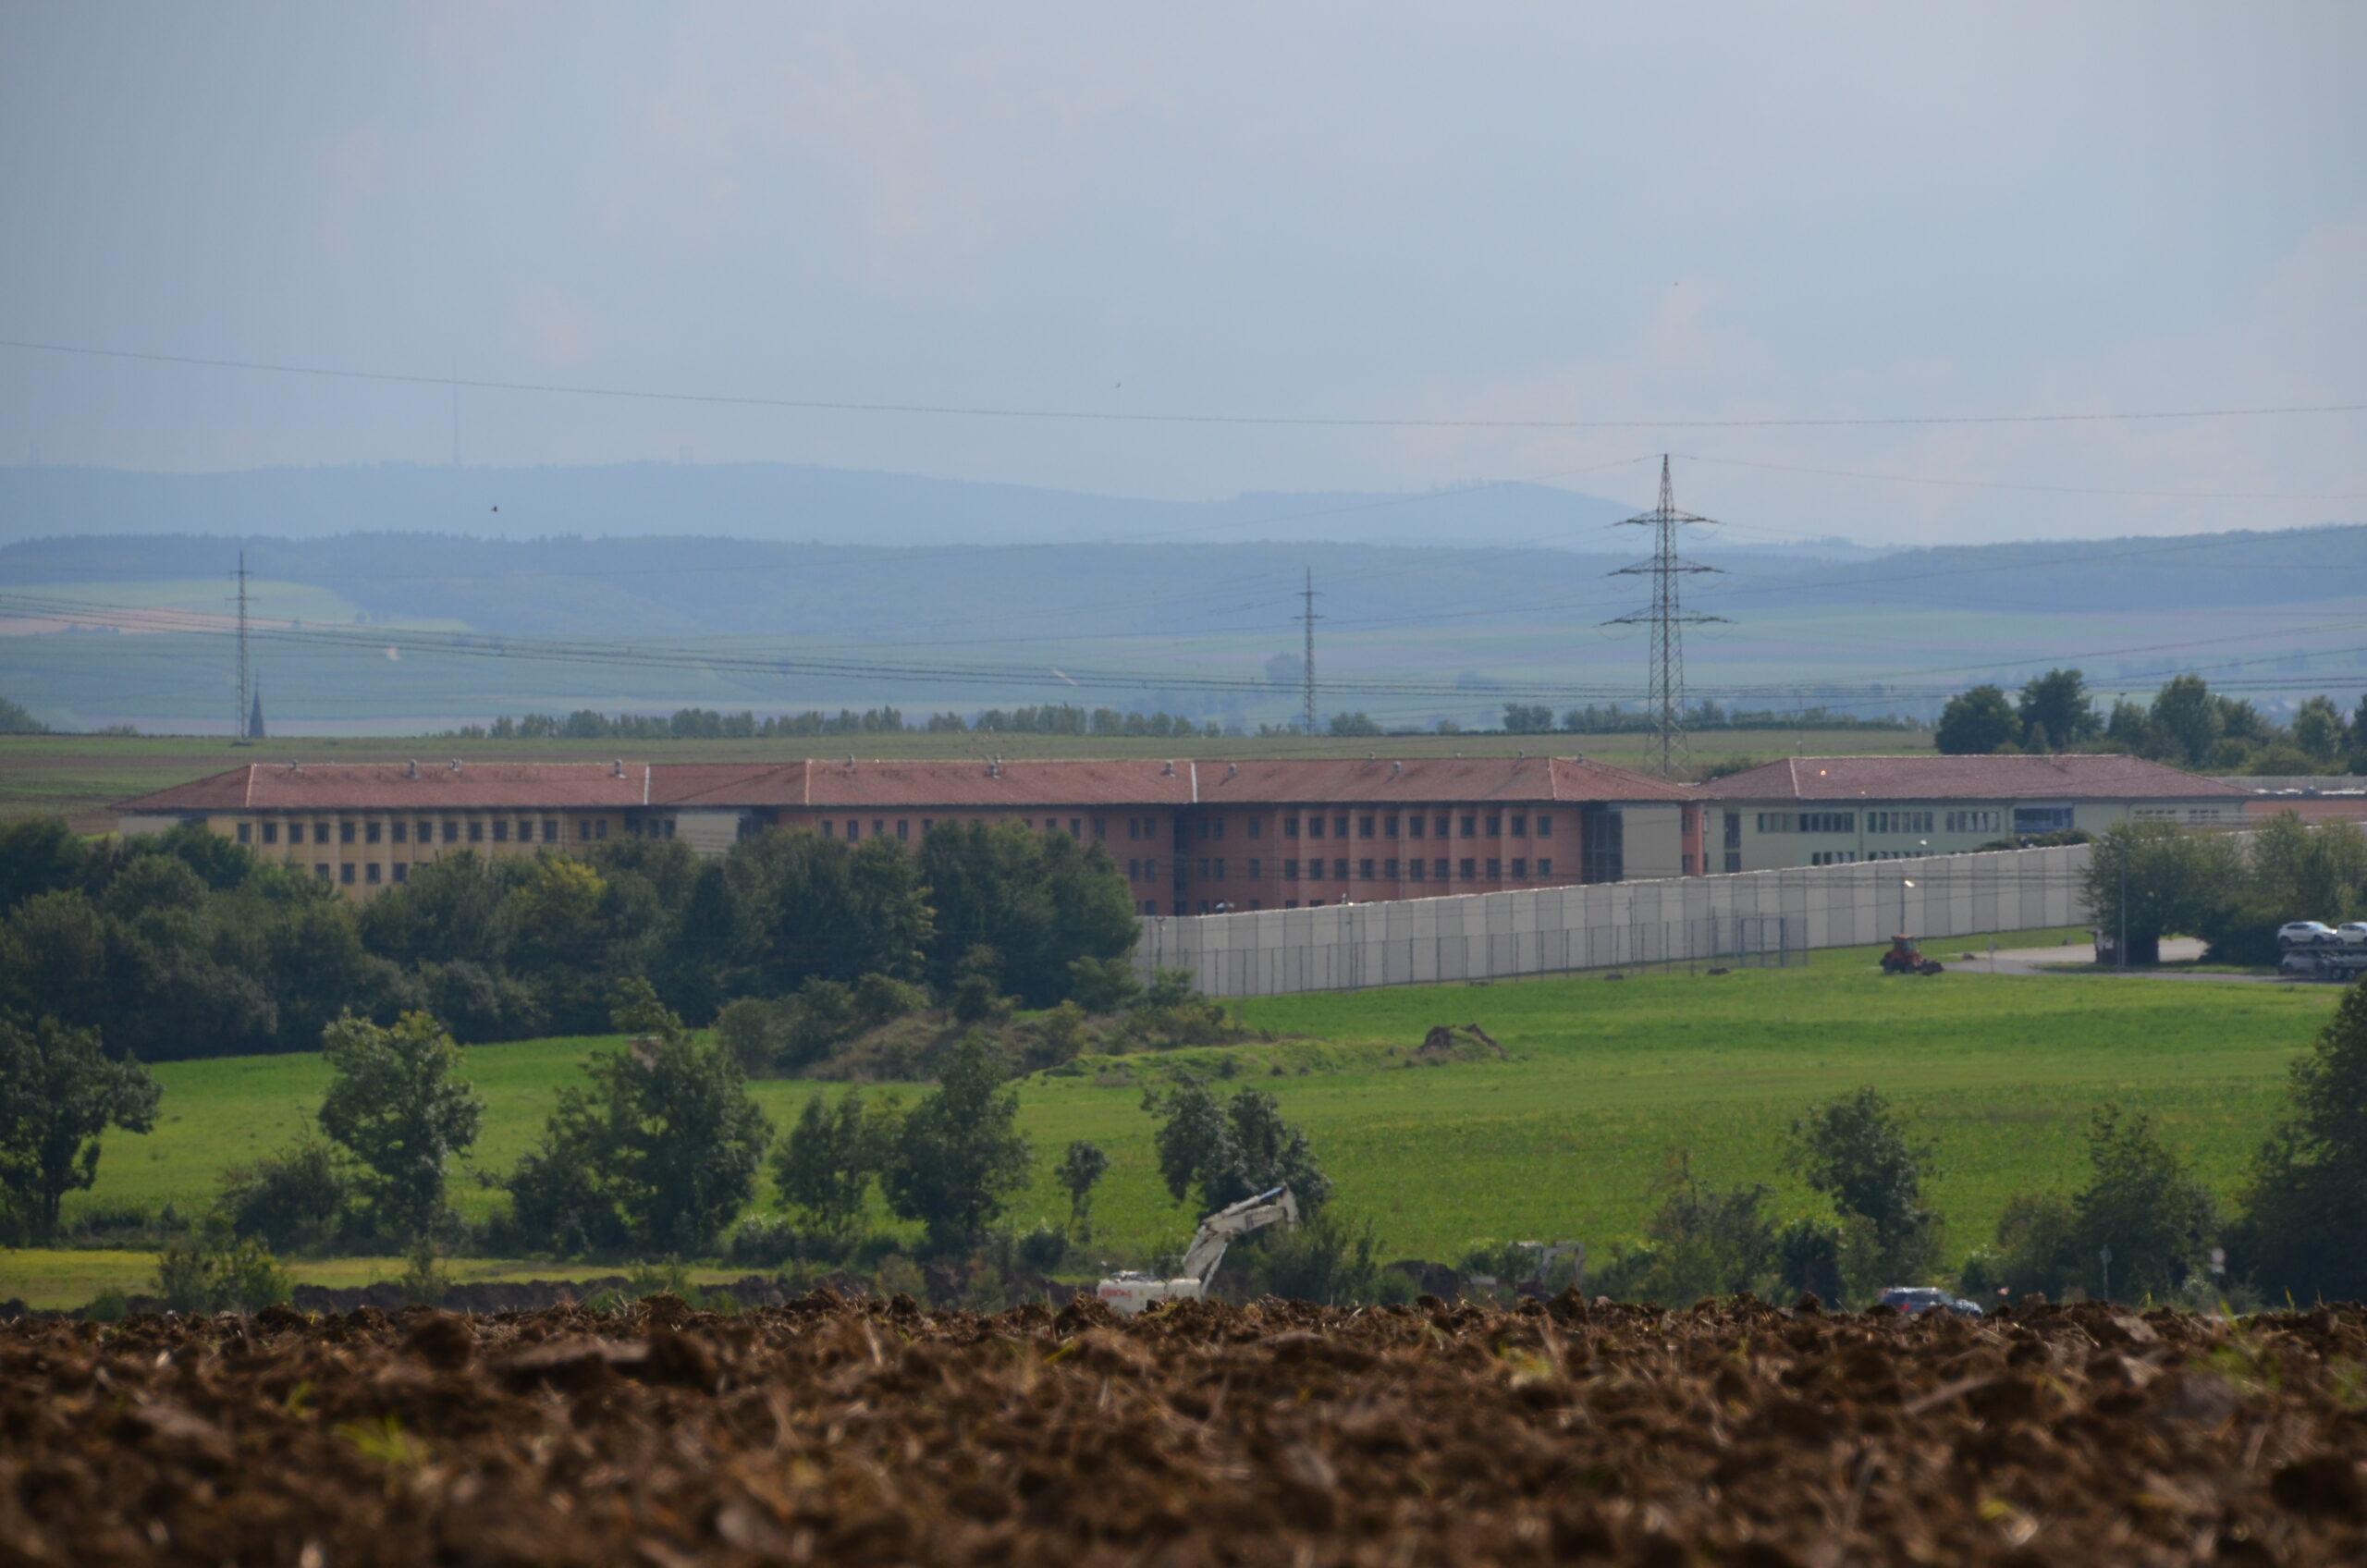 Ansicht der JVA Rohrbach - Justizvollzugsanstalt.org